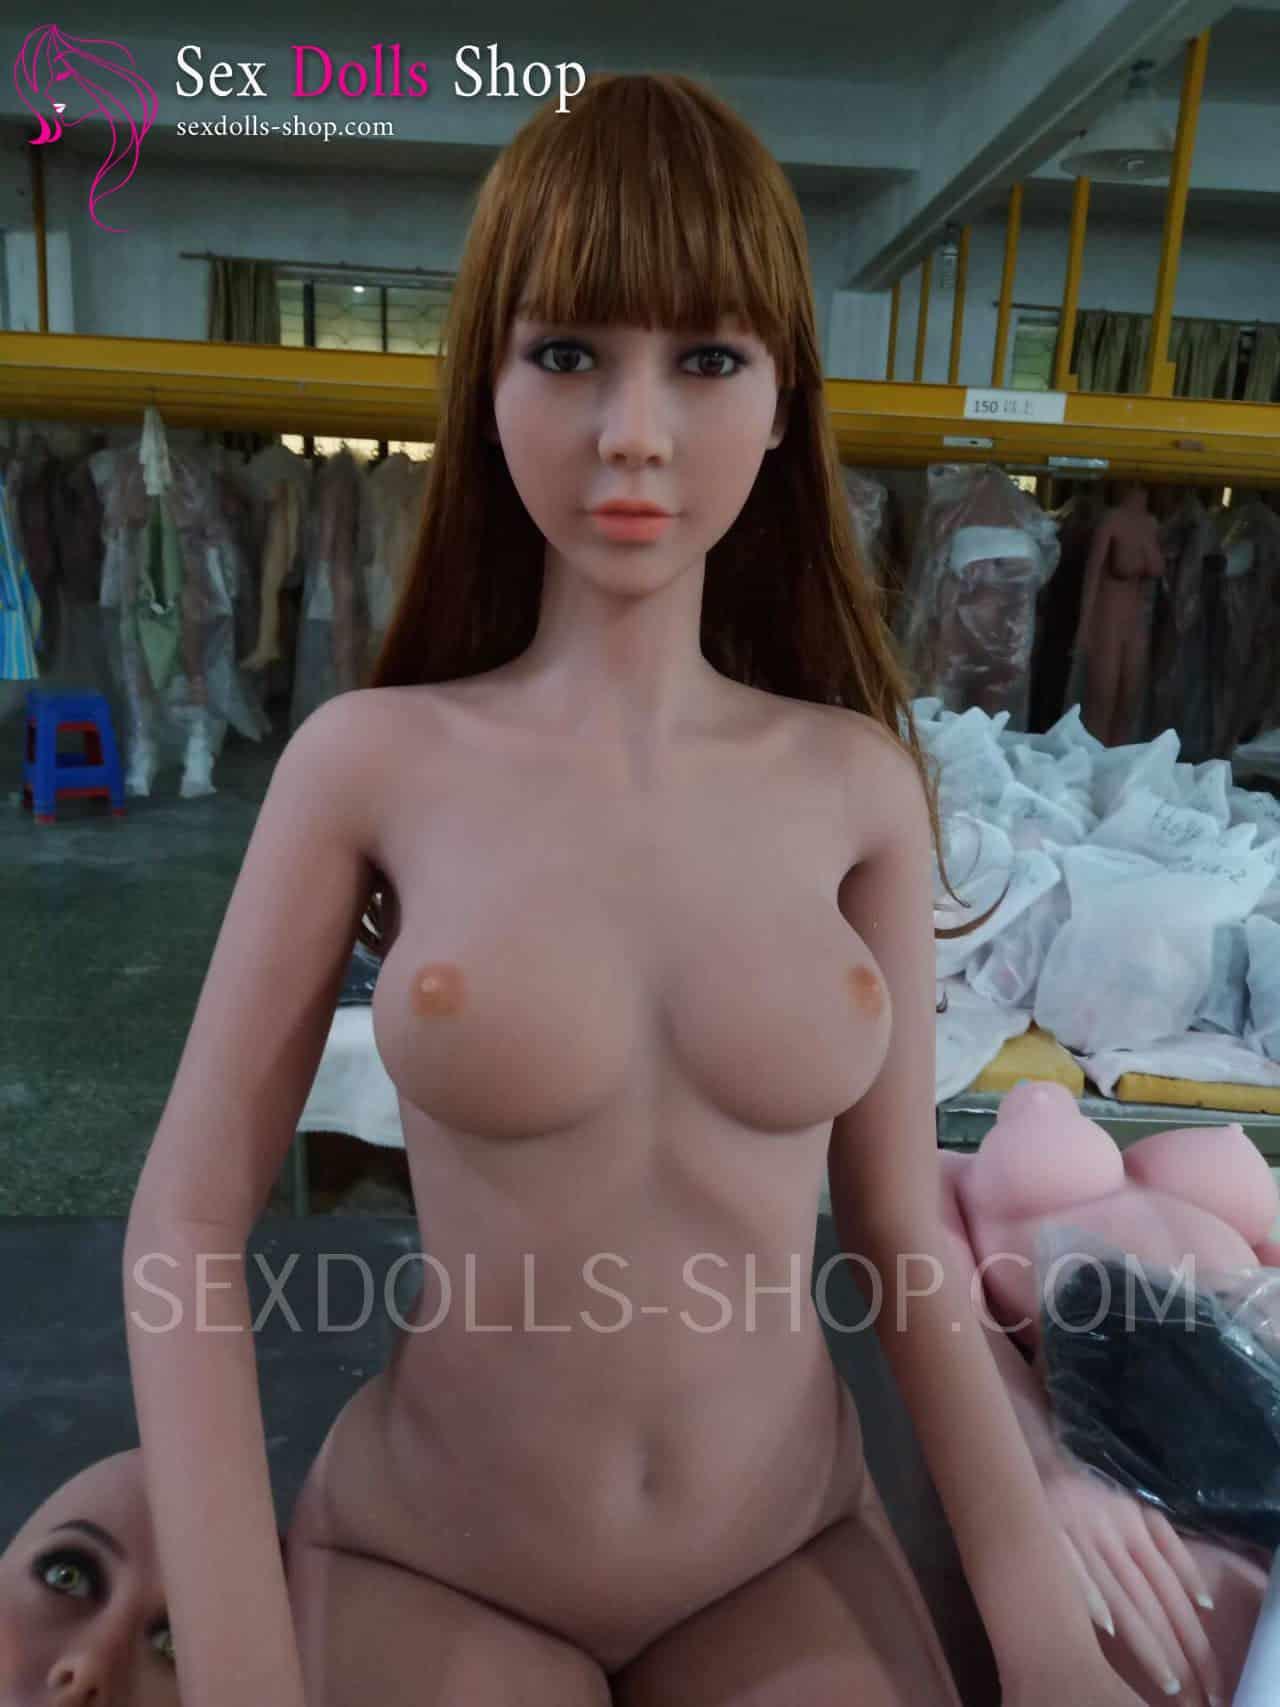 wm 172cm B cup tan skin color light brown nipples head 56